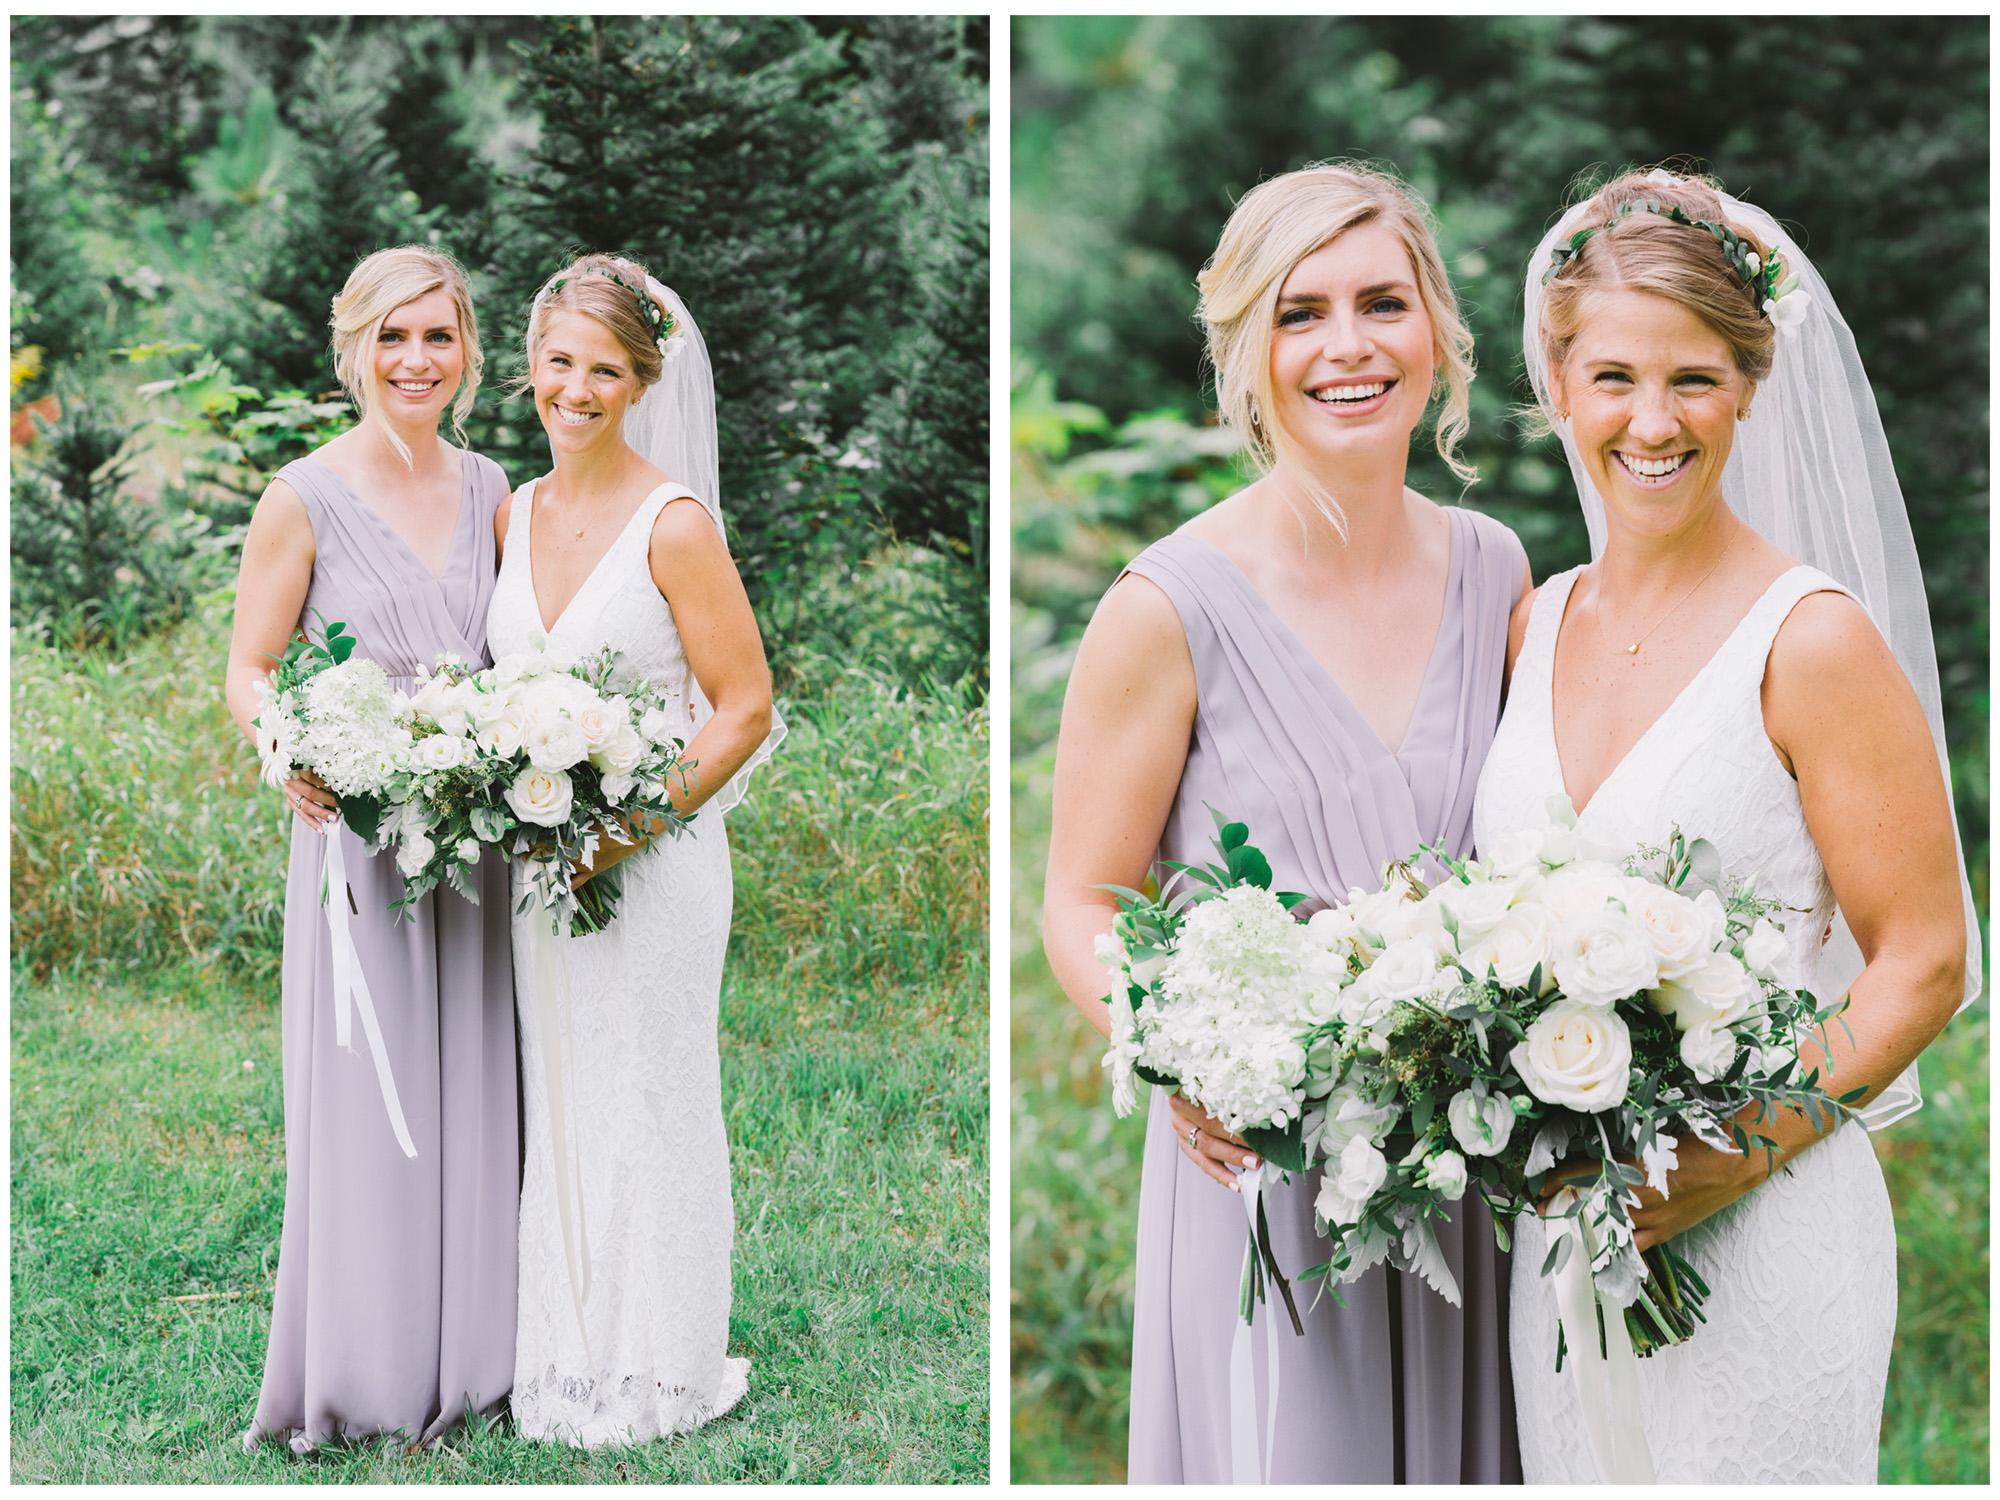 Bridesmaid Photo at Drysdale's Tree Farm